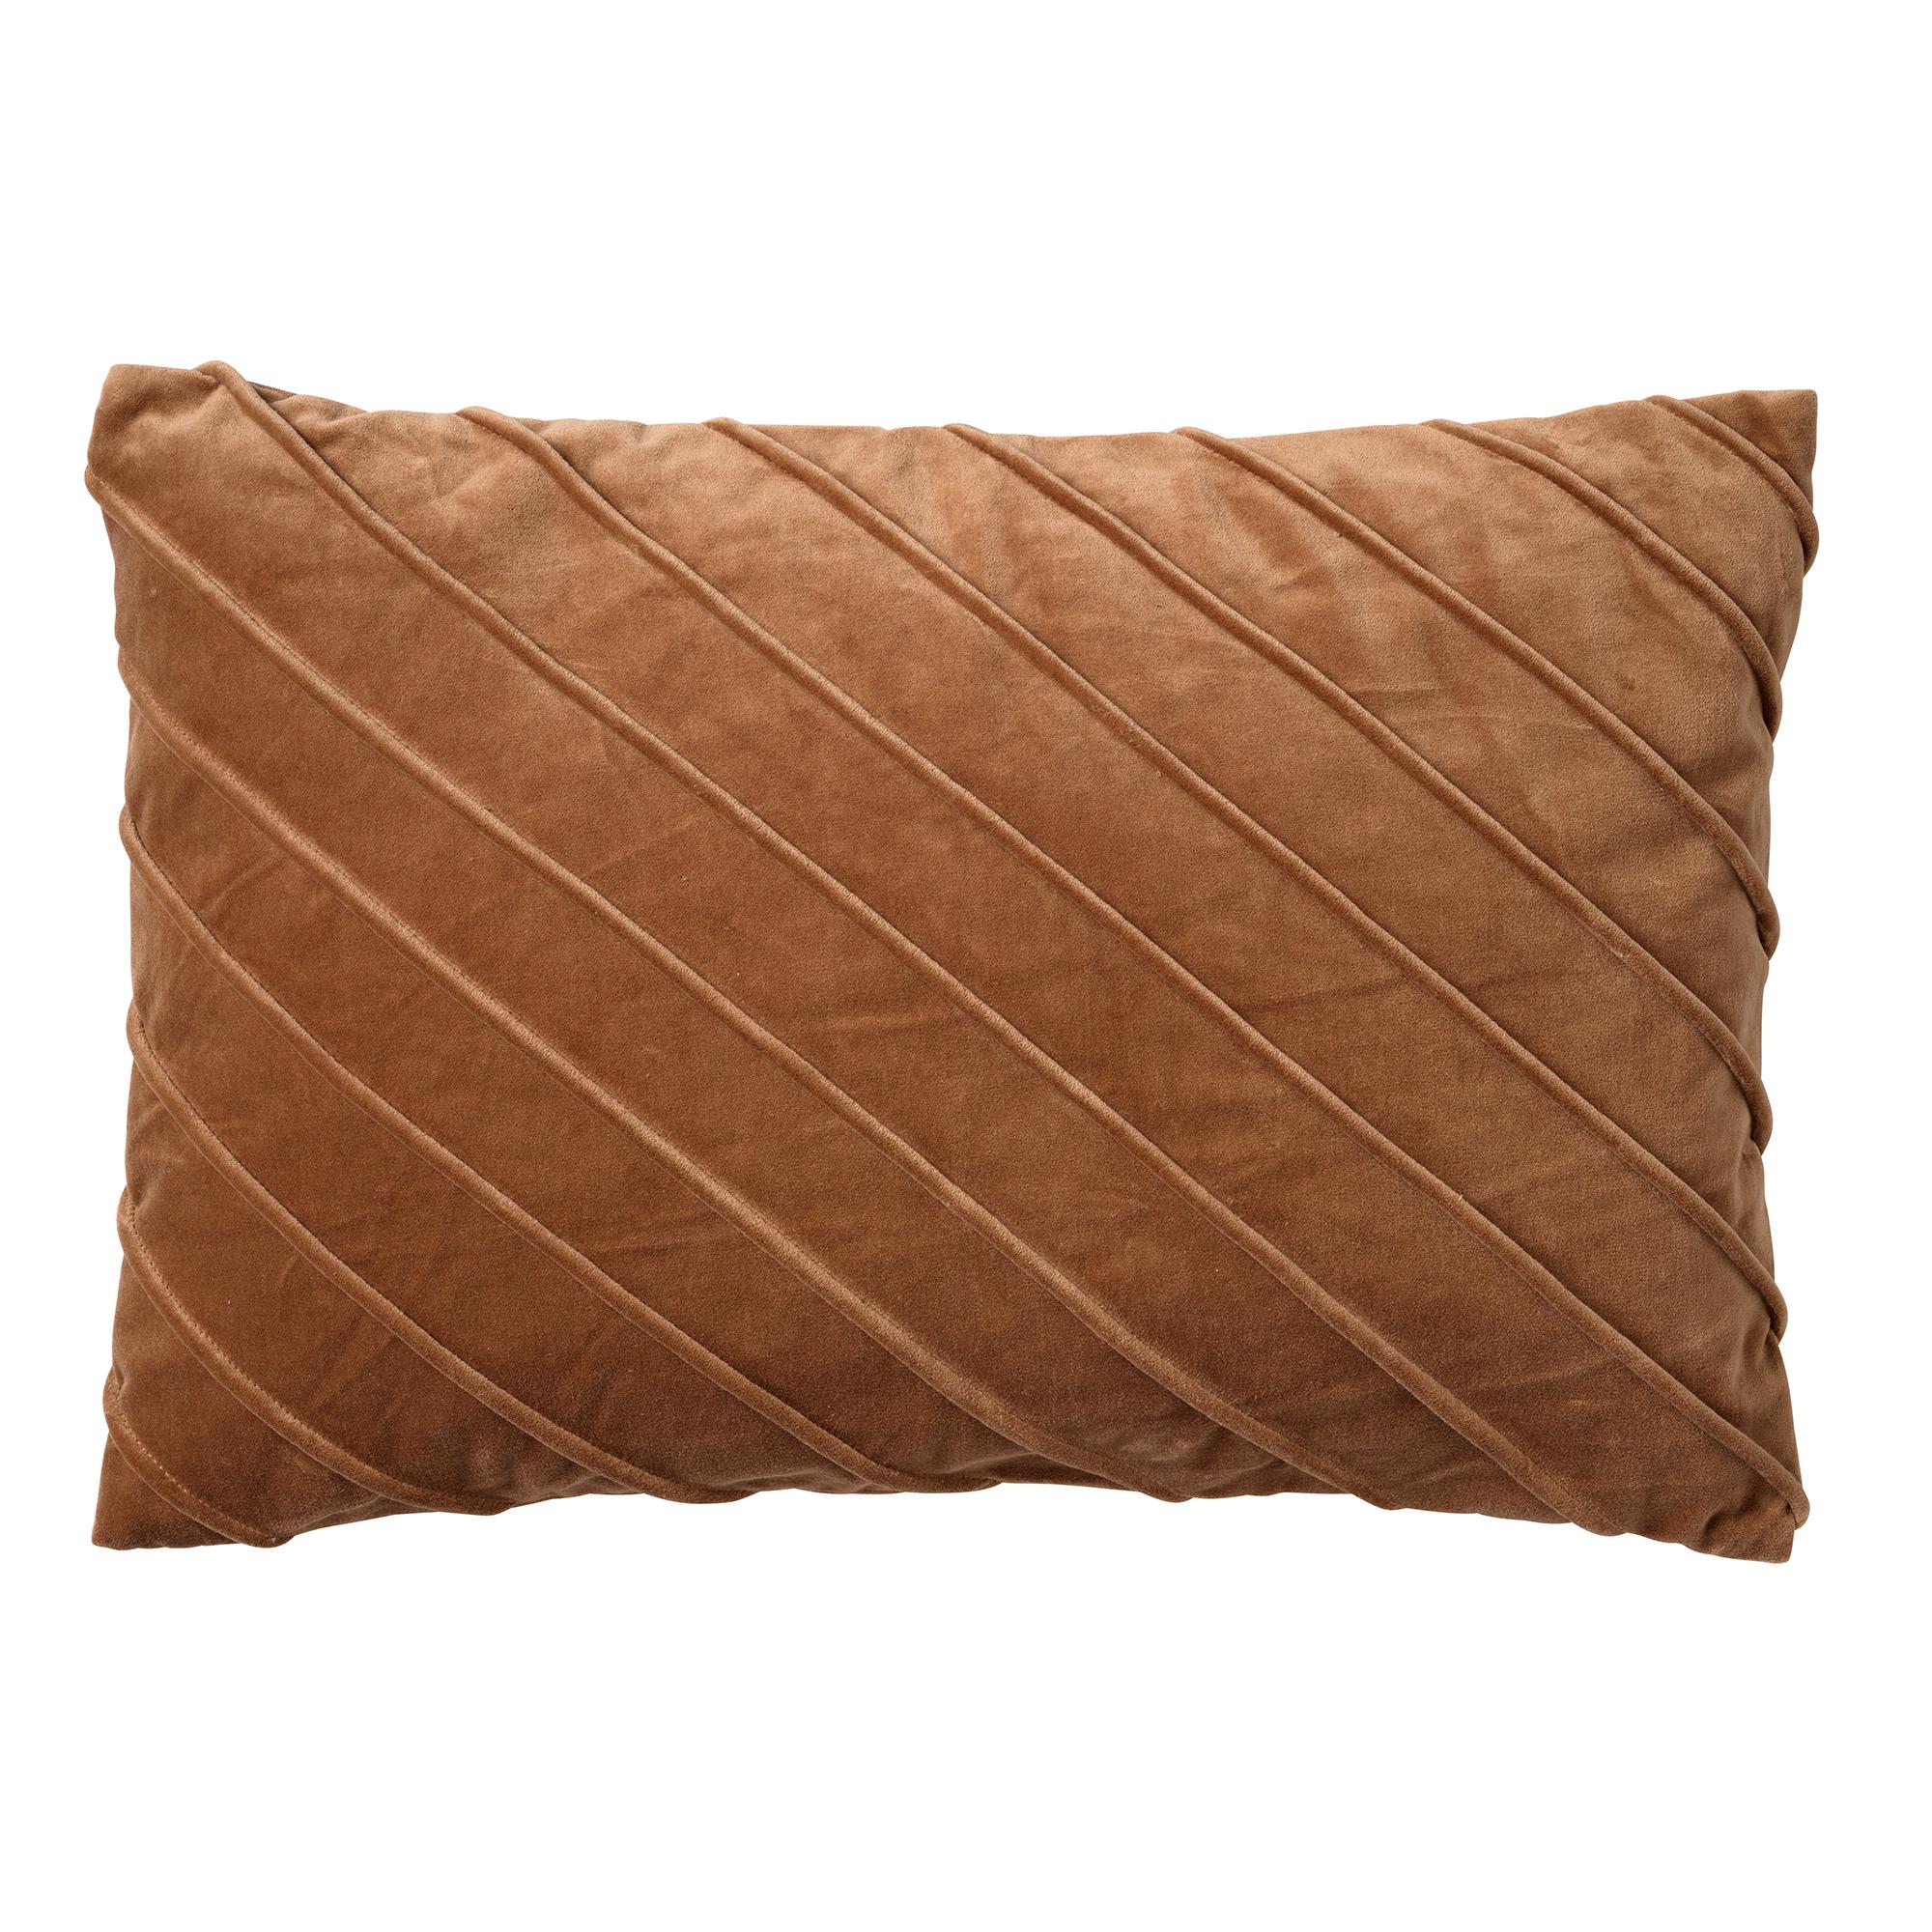 PACO - Kussenhoes velvet 40x60 cm Tobacco brown